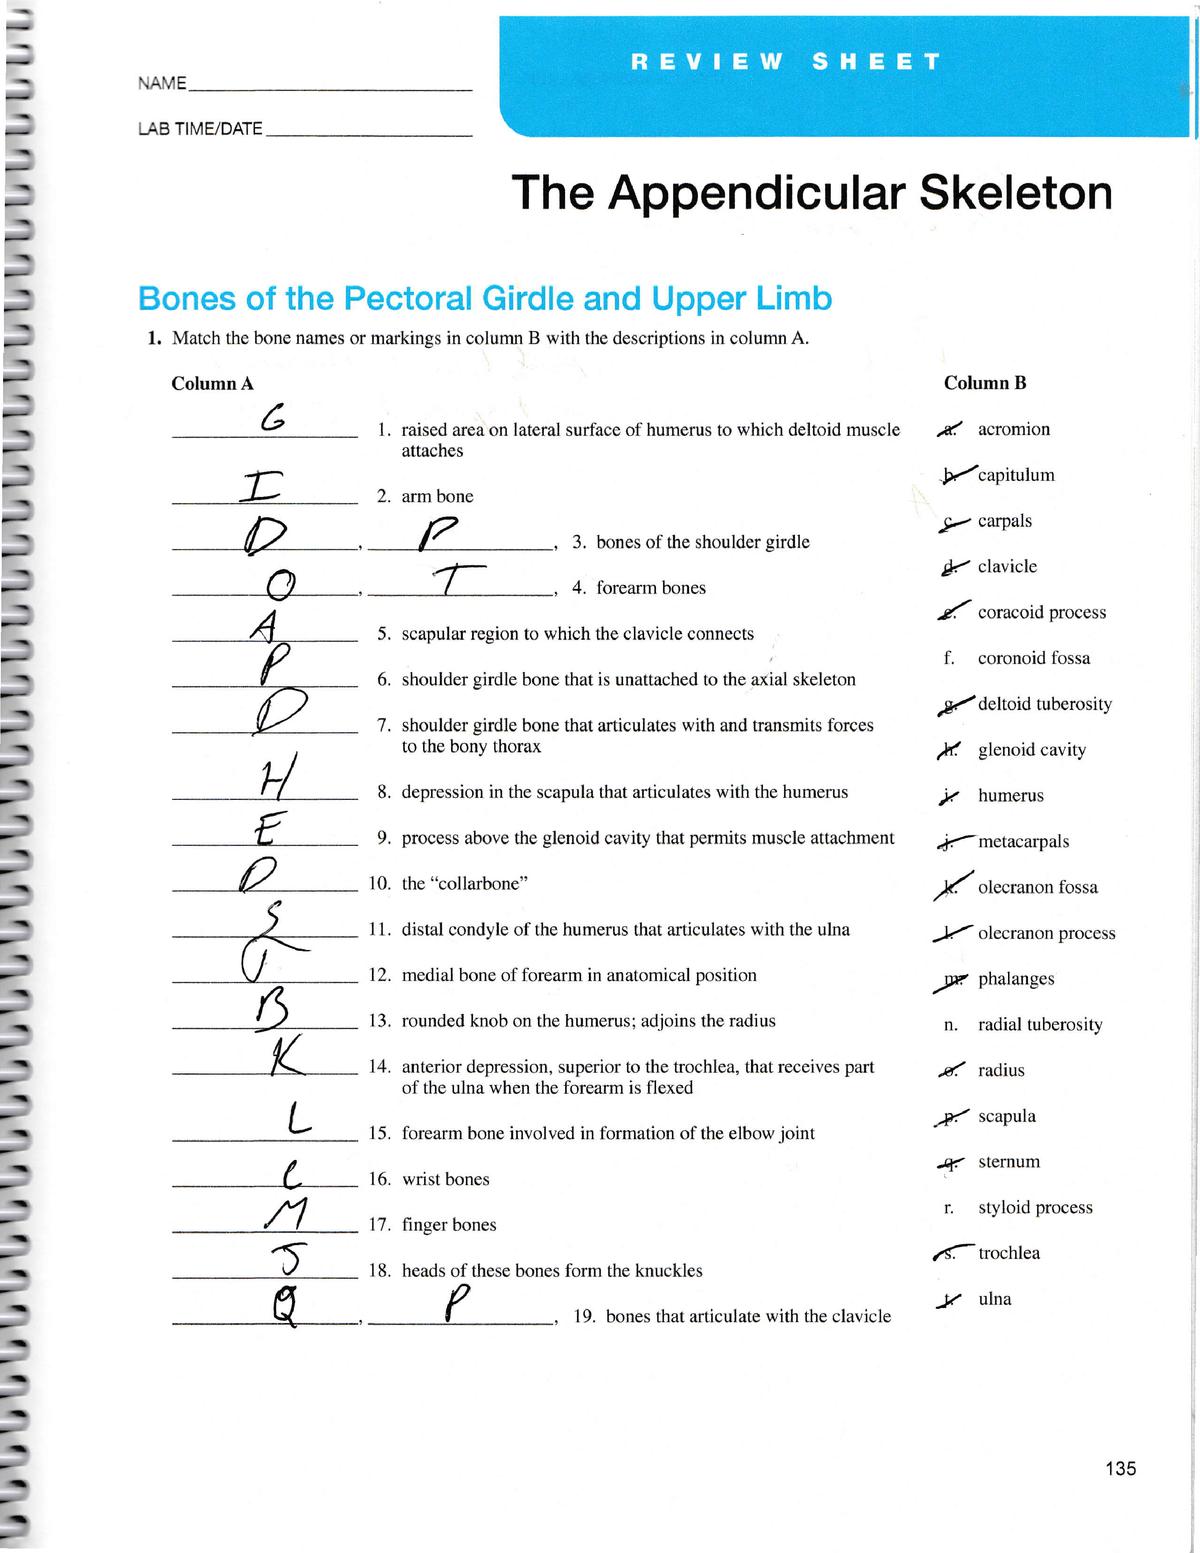 The apendicular skeleton answers - BSC 2085C - StuDocu